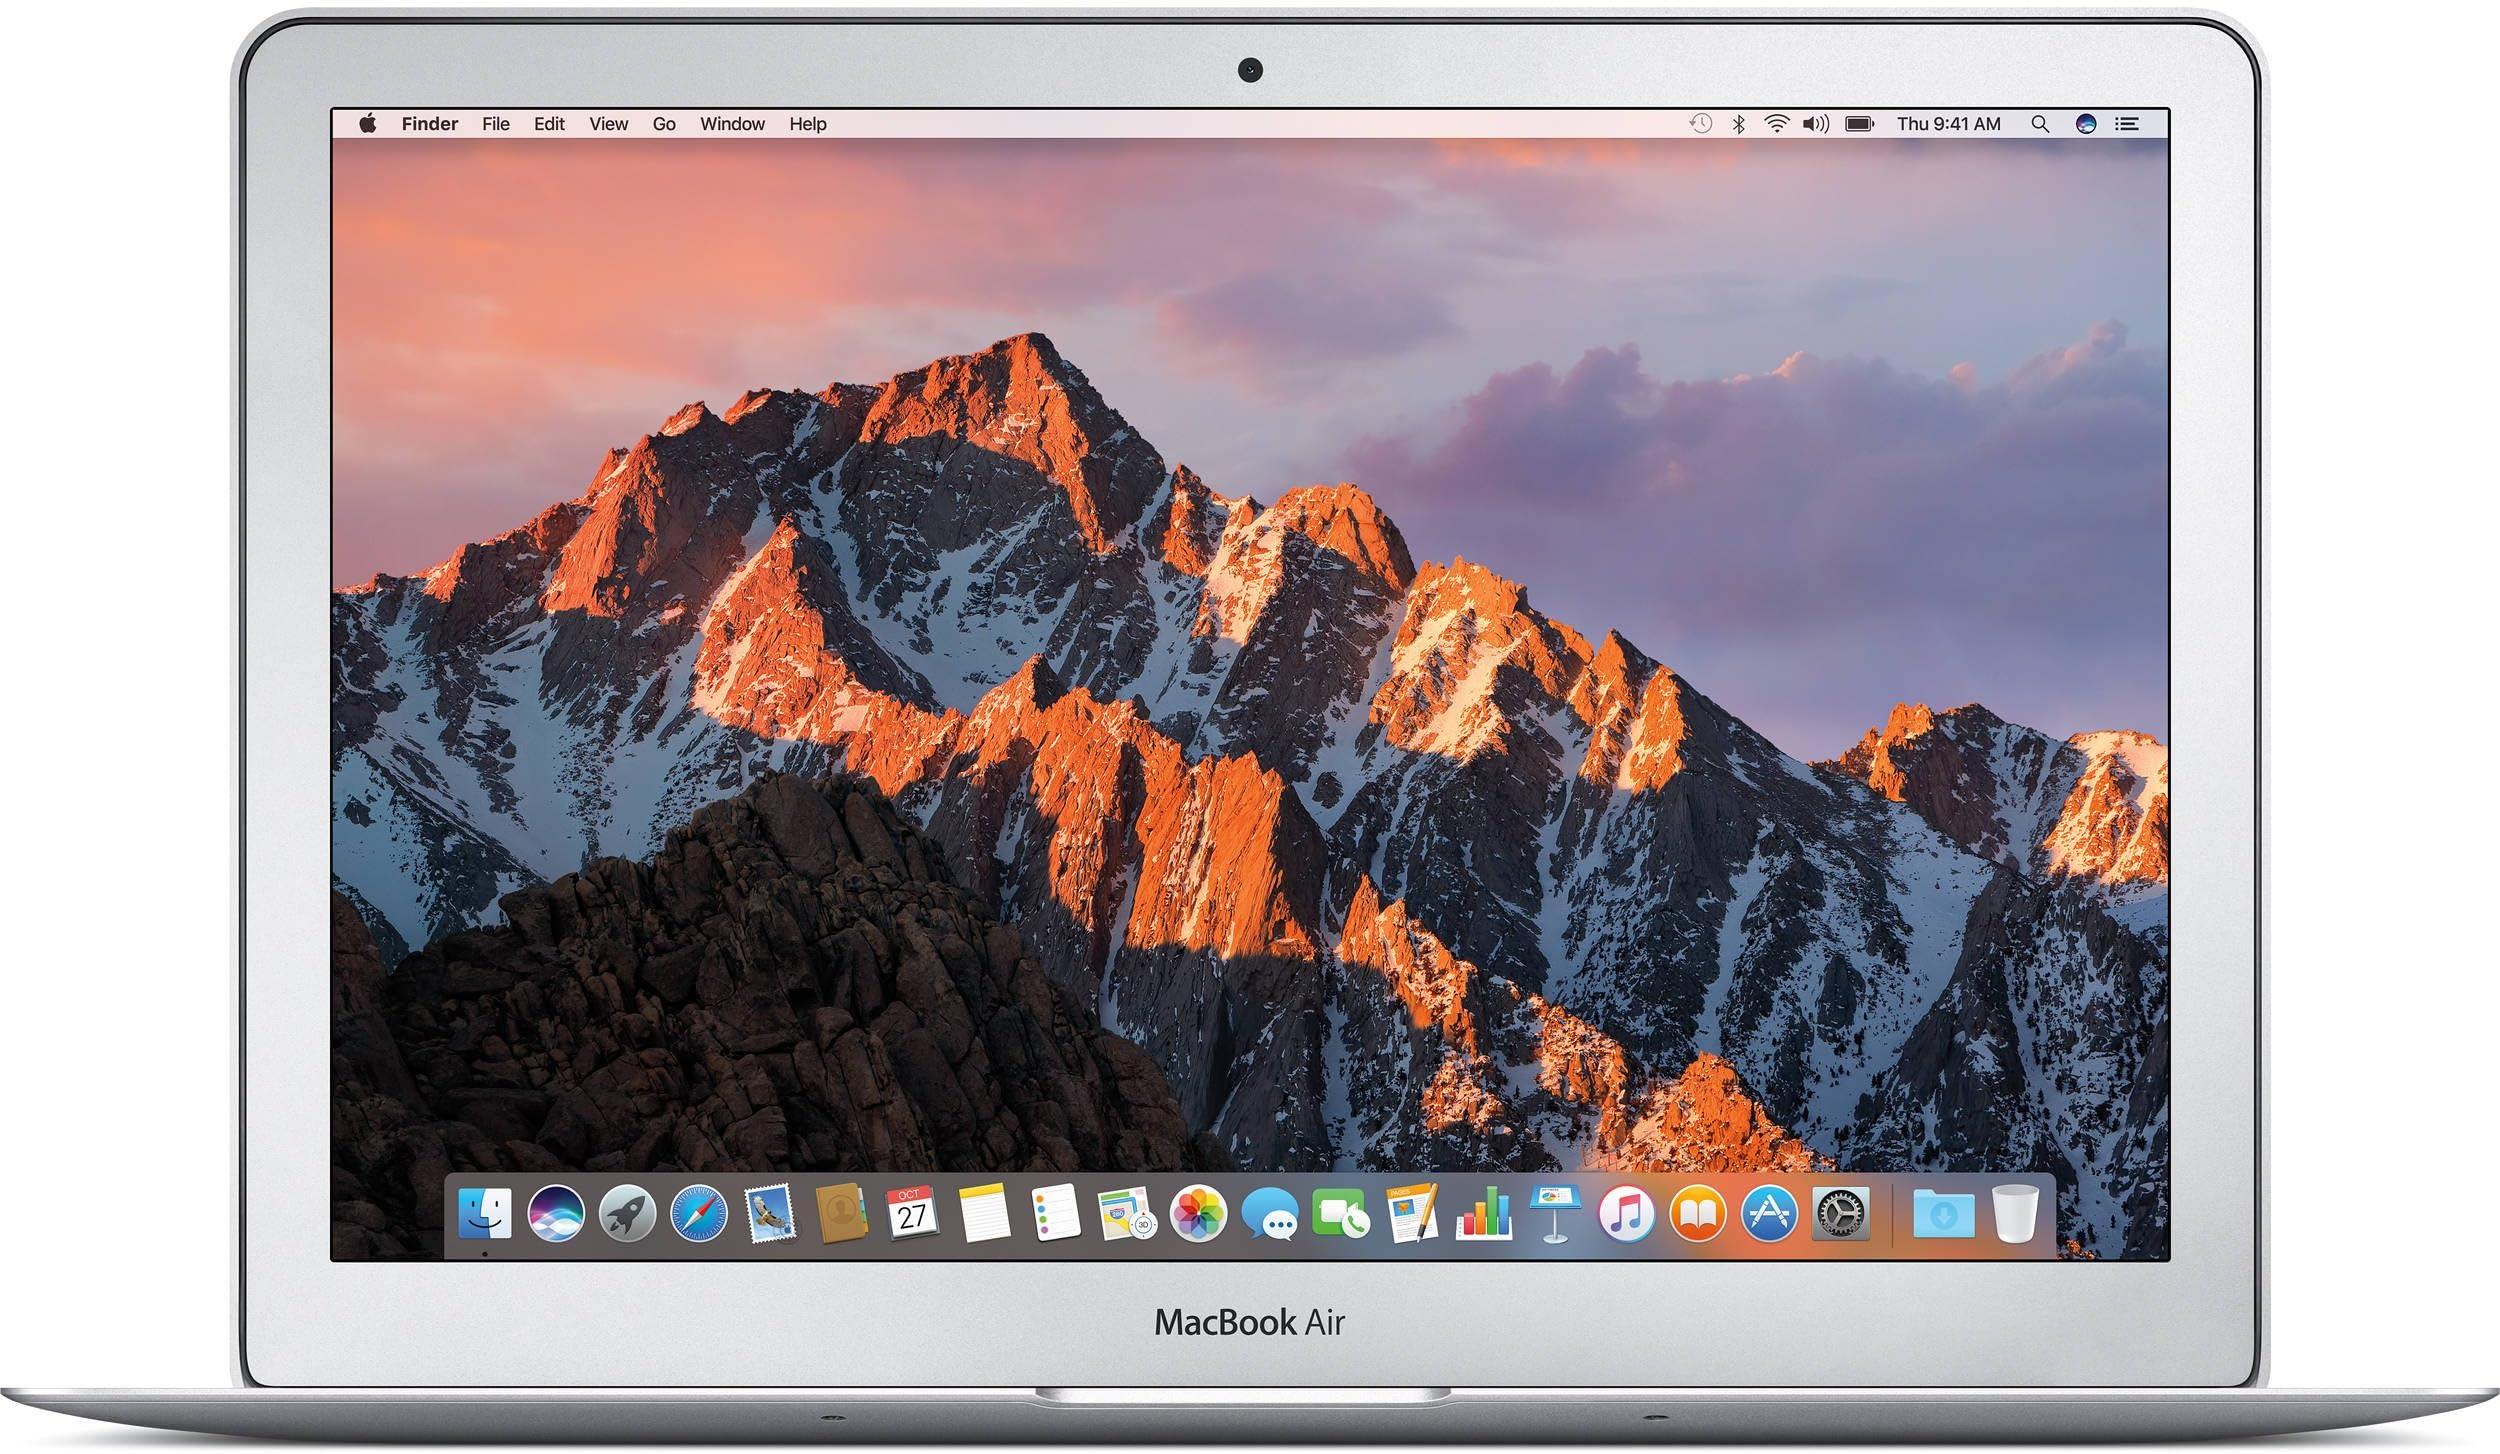 Apple MacBook Air MJVM2LL/A 11.6 Inch Laptop (Intel Core i5 Dual-Core 1.6GHz up to 2.7GHz, 4GB RAM, 128GB SSD, Wi-Fi, Bluetooth 4.0, Integrated Intel HD Graphics 6000, Mac OS) (Renewed)